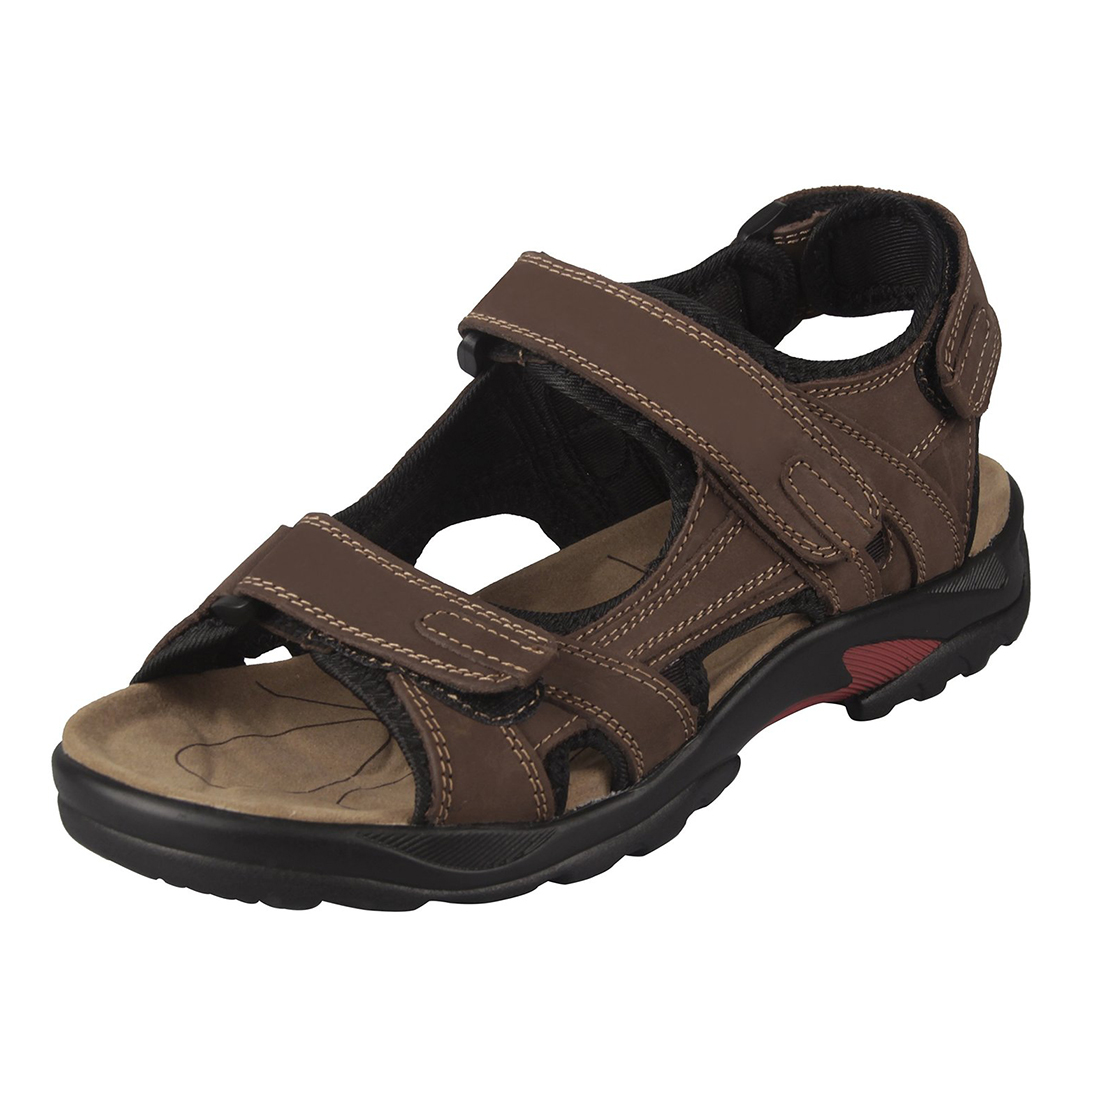 New Mens sandals Leather sandals men leather Shoes